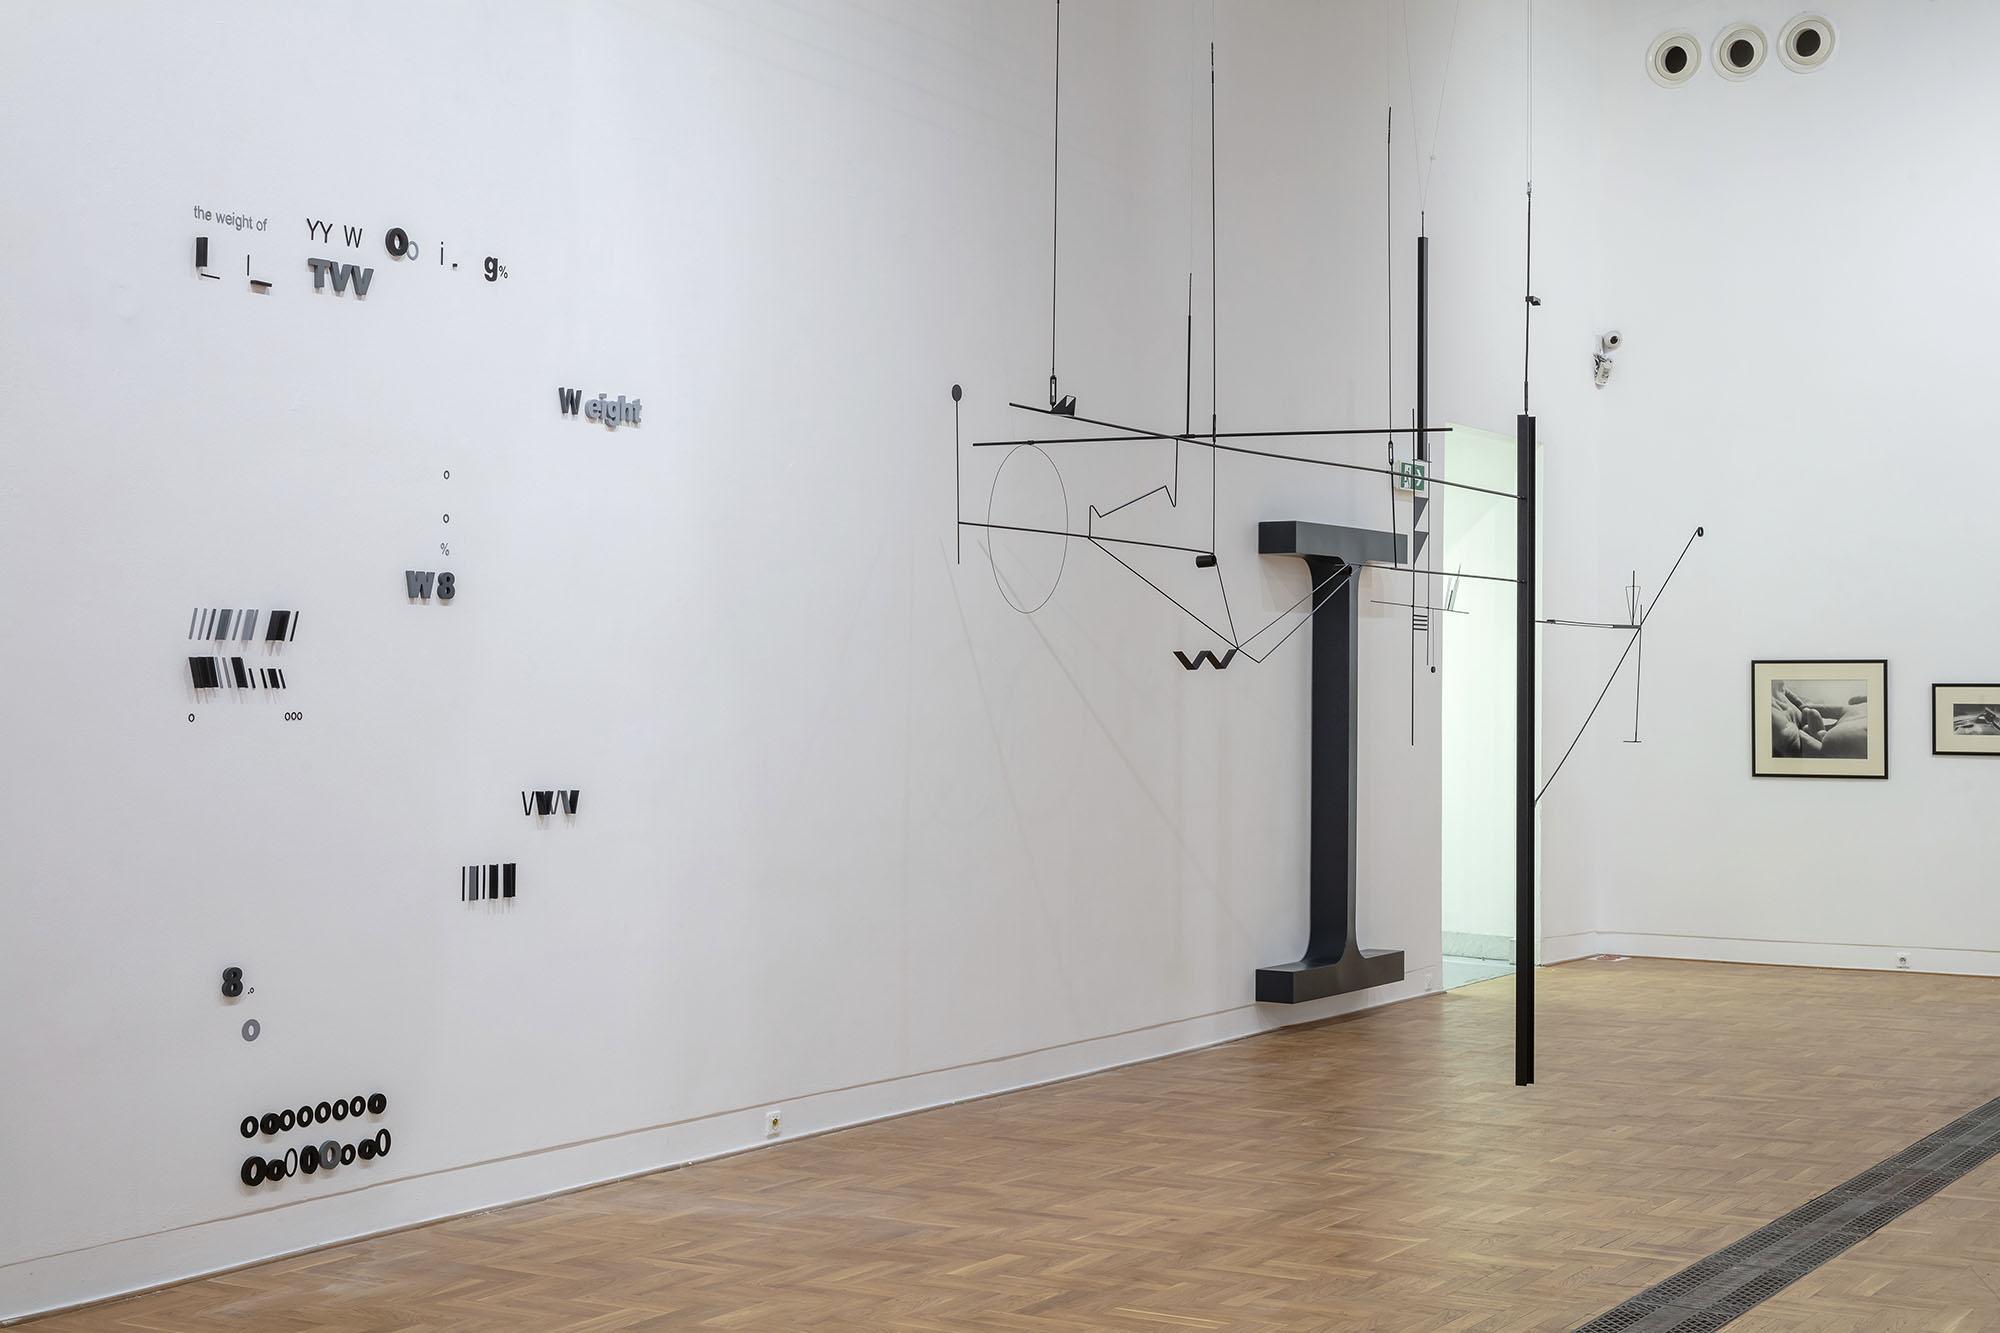 Marlena Kudlicka, the weight of 8, 2014/2020, site specific sculptural installation powdercoated steel, © Marlena Kudlicka, photo: Daniel Rumiancew, courtesy: Zachęta – National Gallery of Art, Warsaw